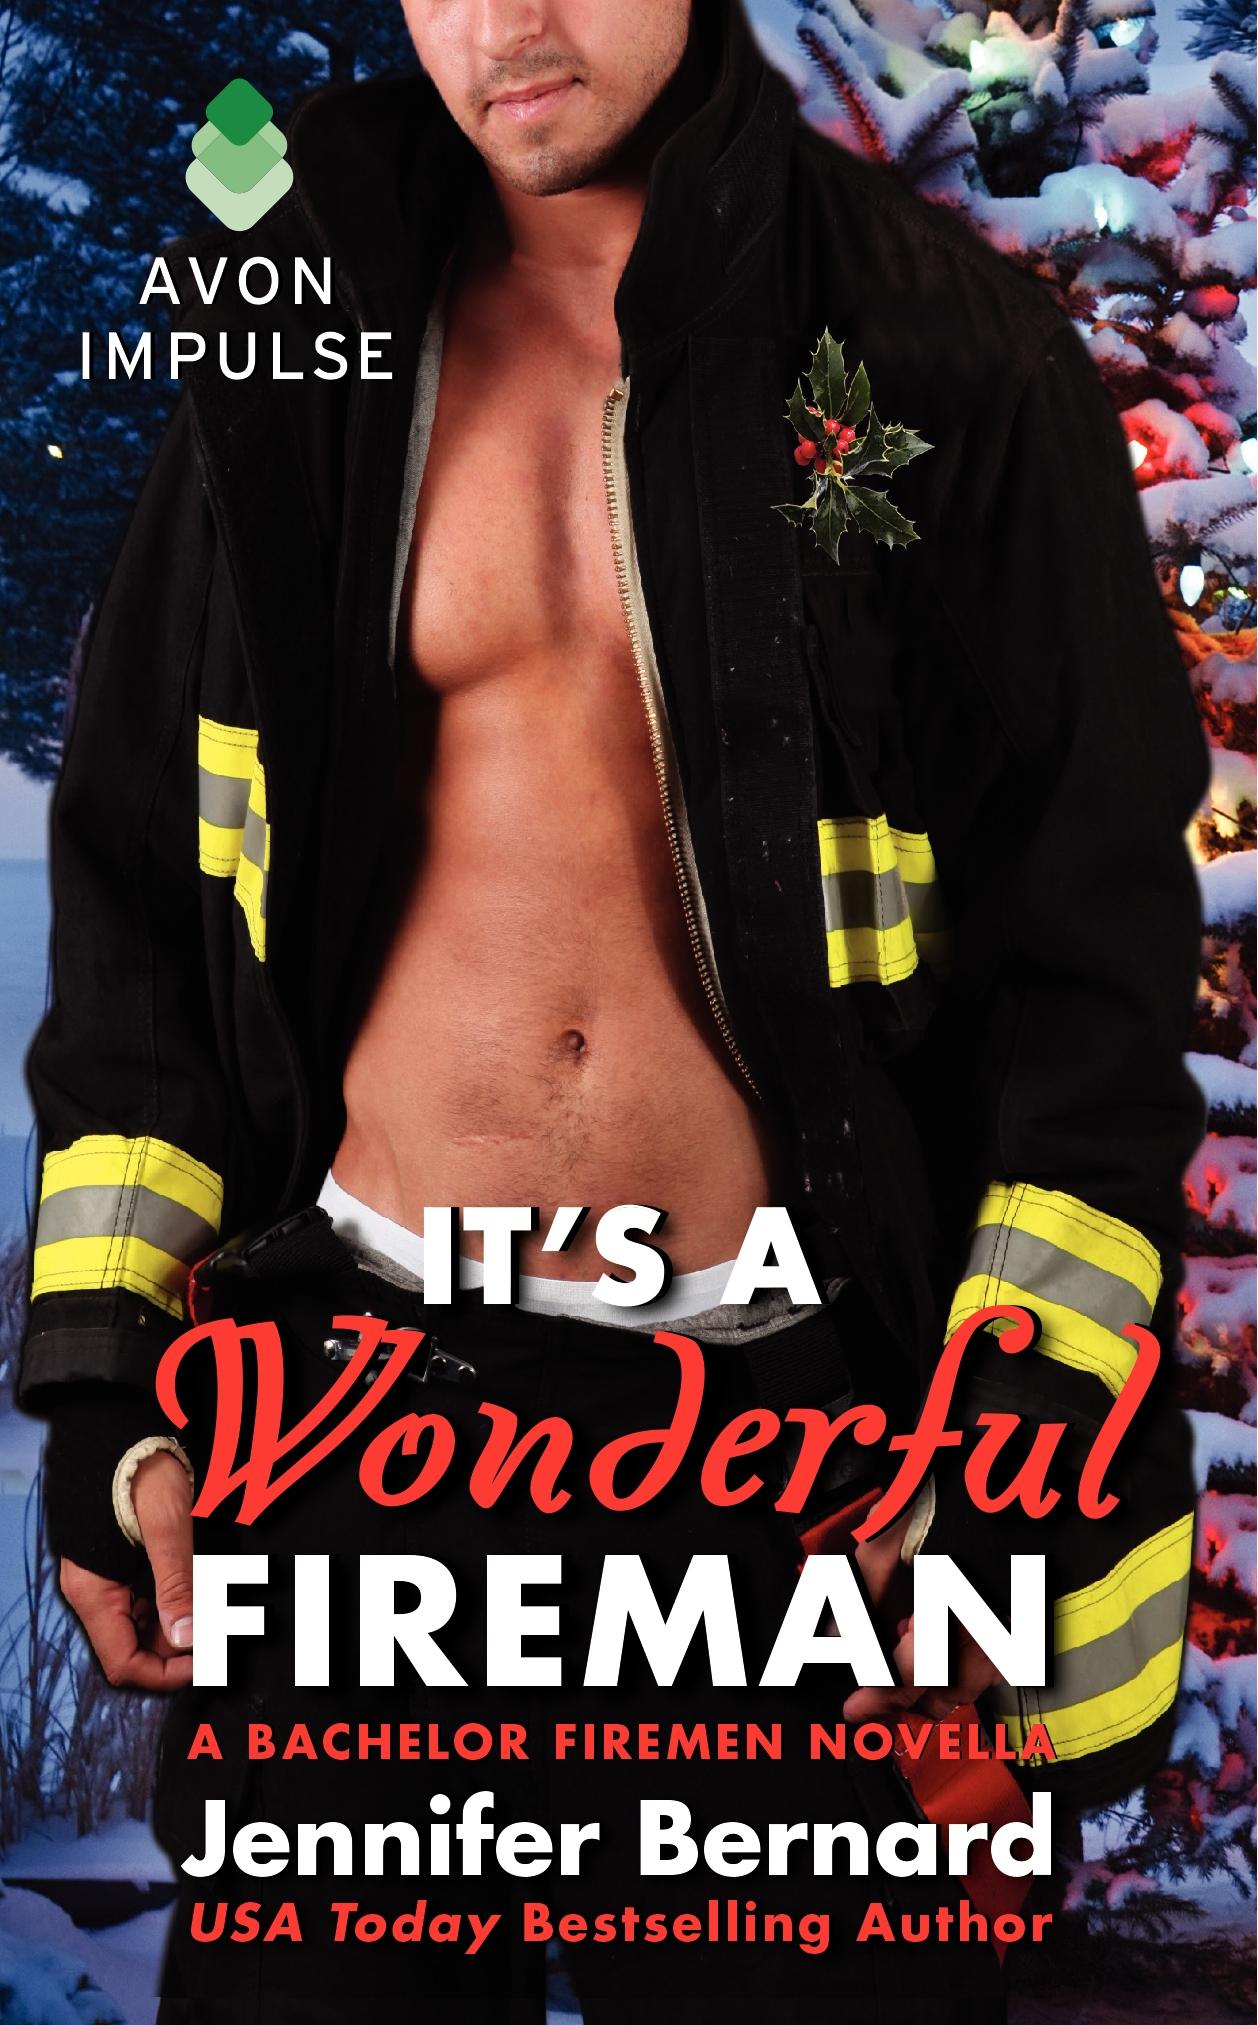 Jennifer Bernard The Bachelor Firemen of San Gabriel It's a Wonderful Fireman 6.5.jpg